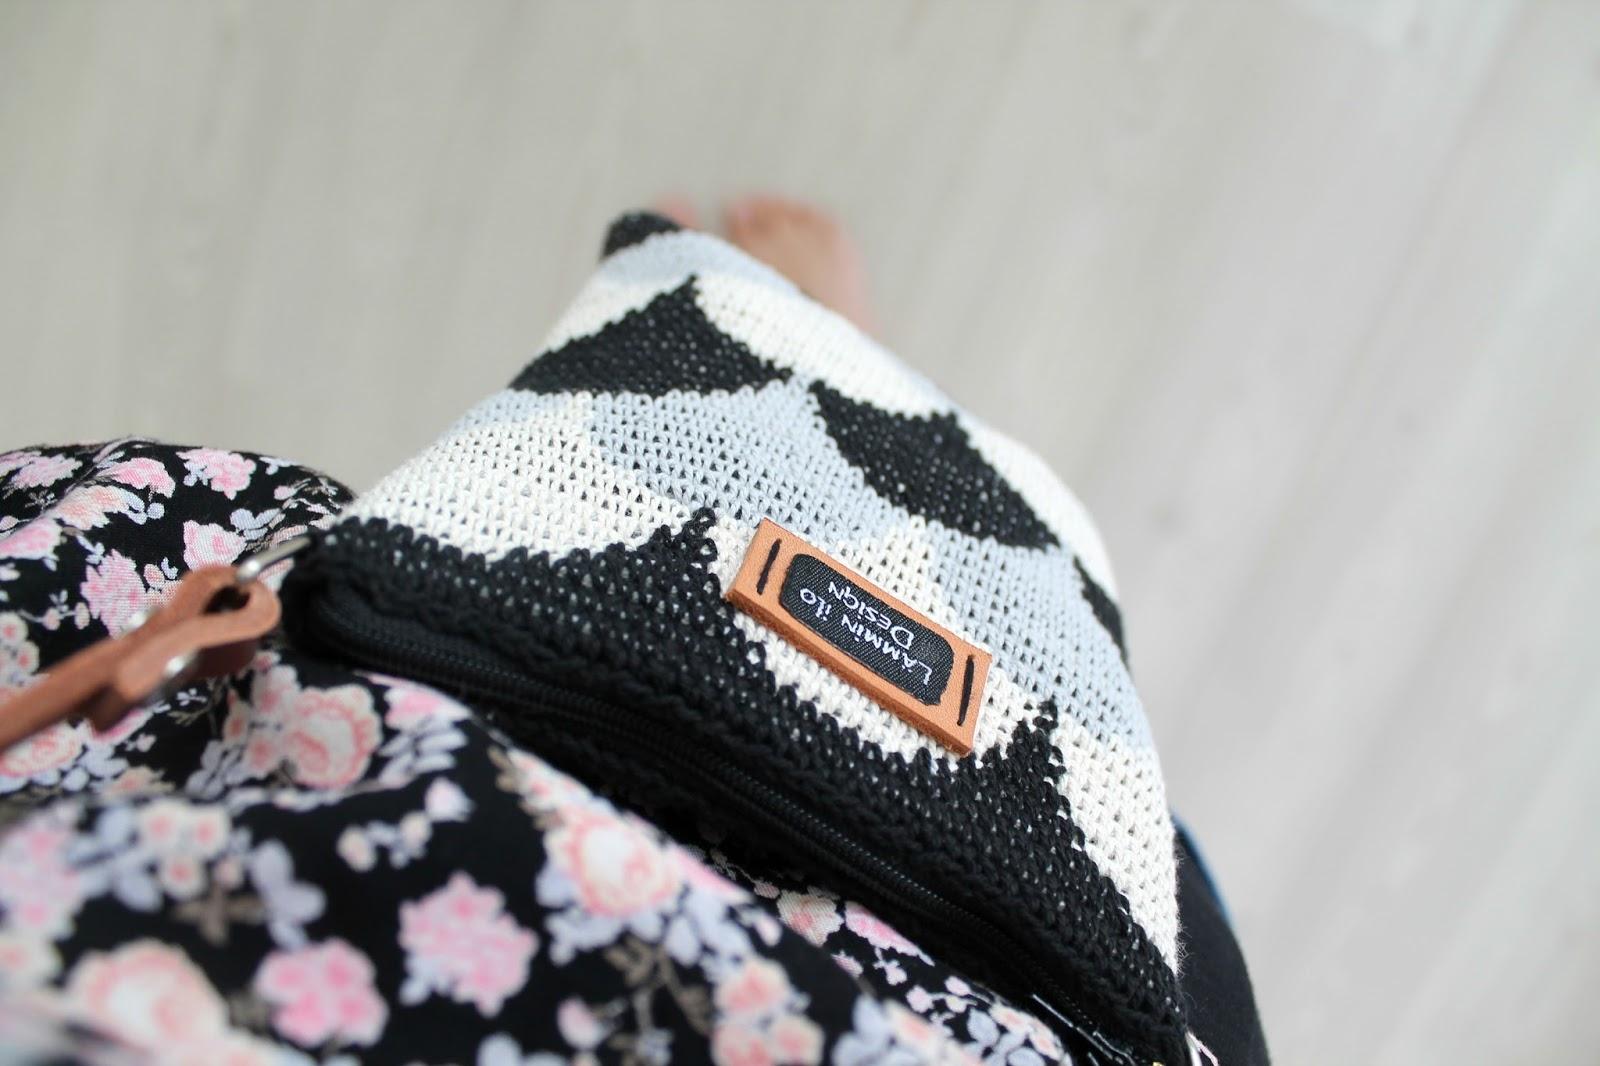 Pieni Adidas Laukku : L?mmin ilo pieni suomu laukku